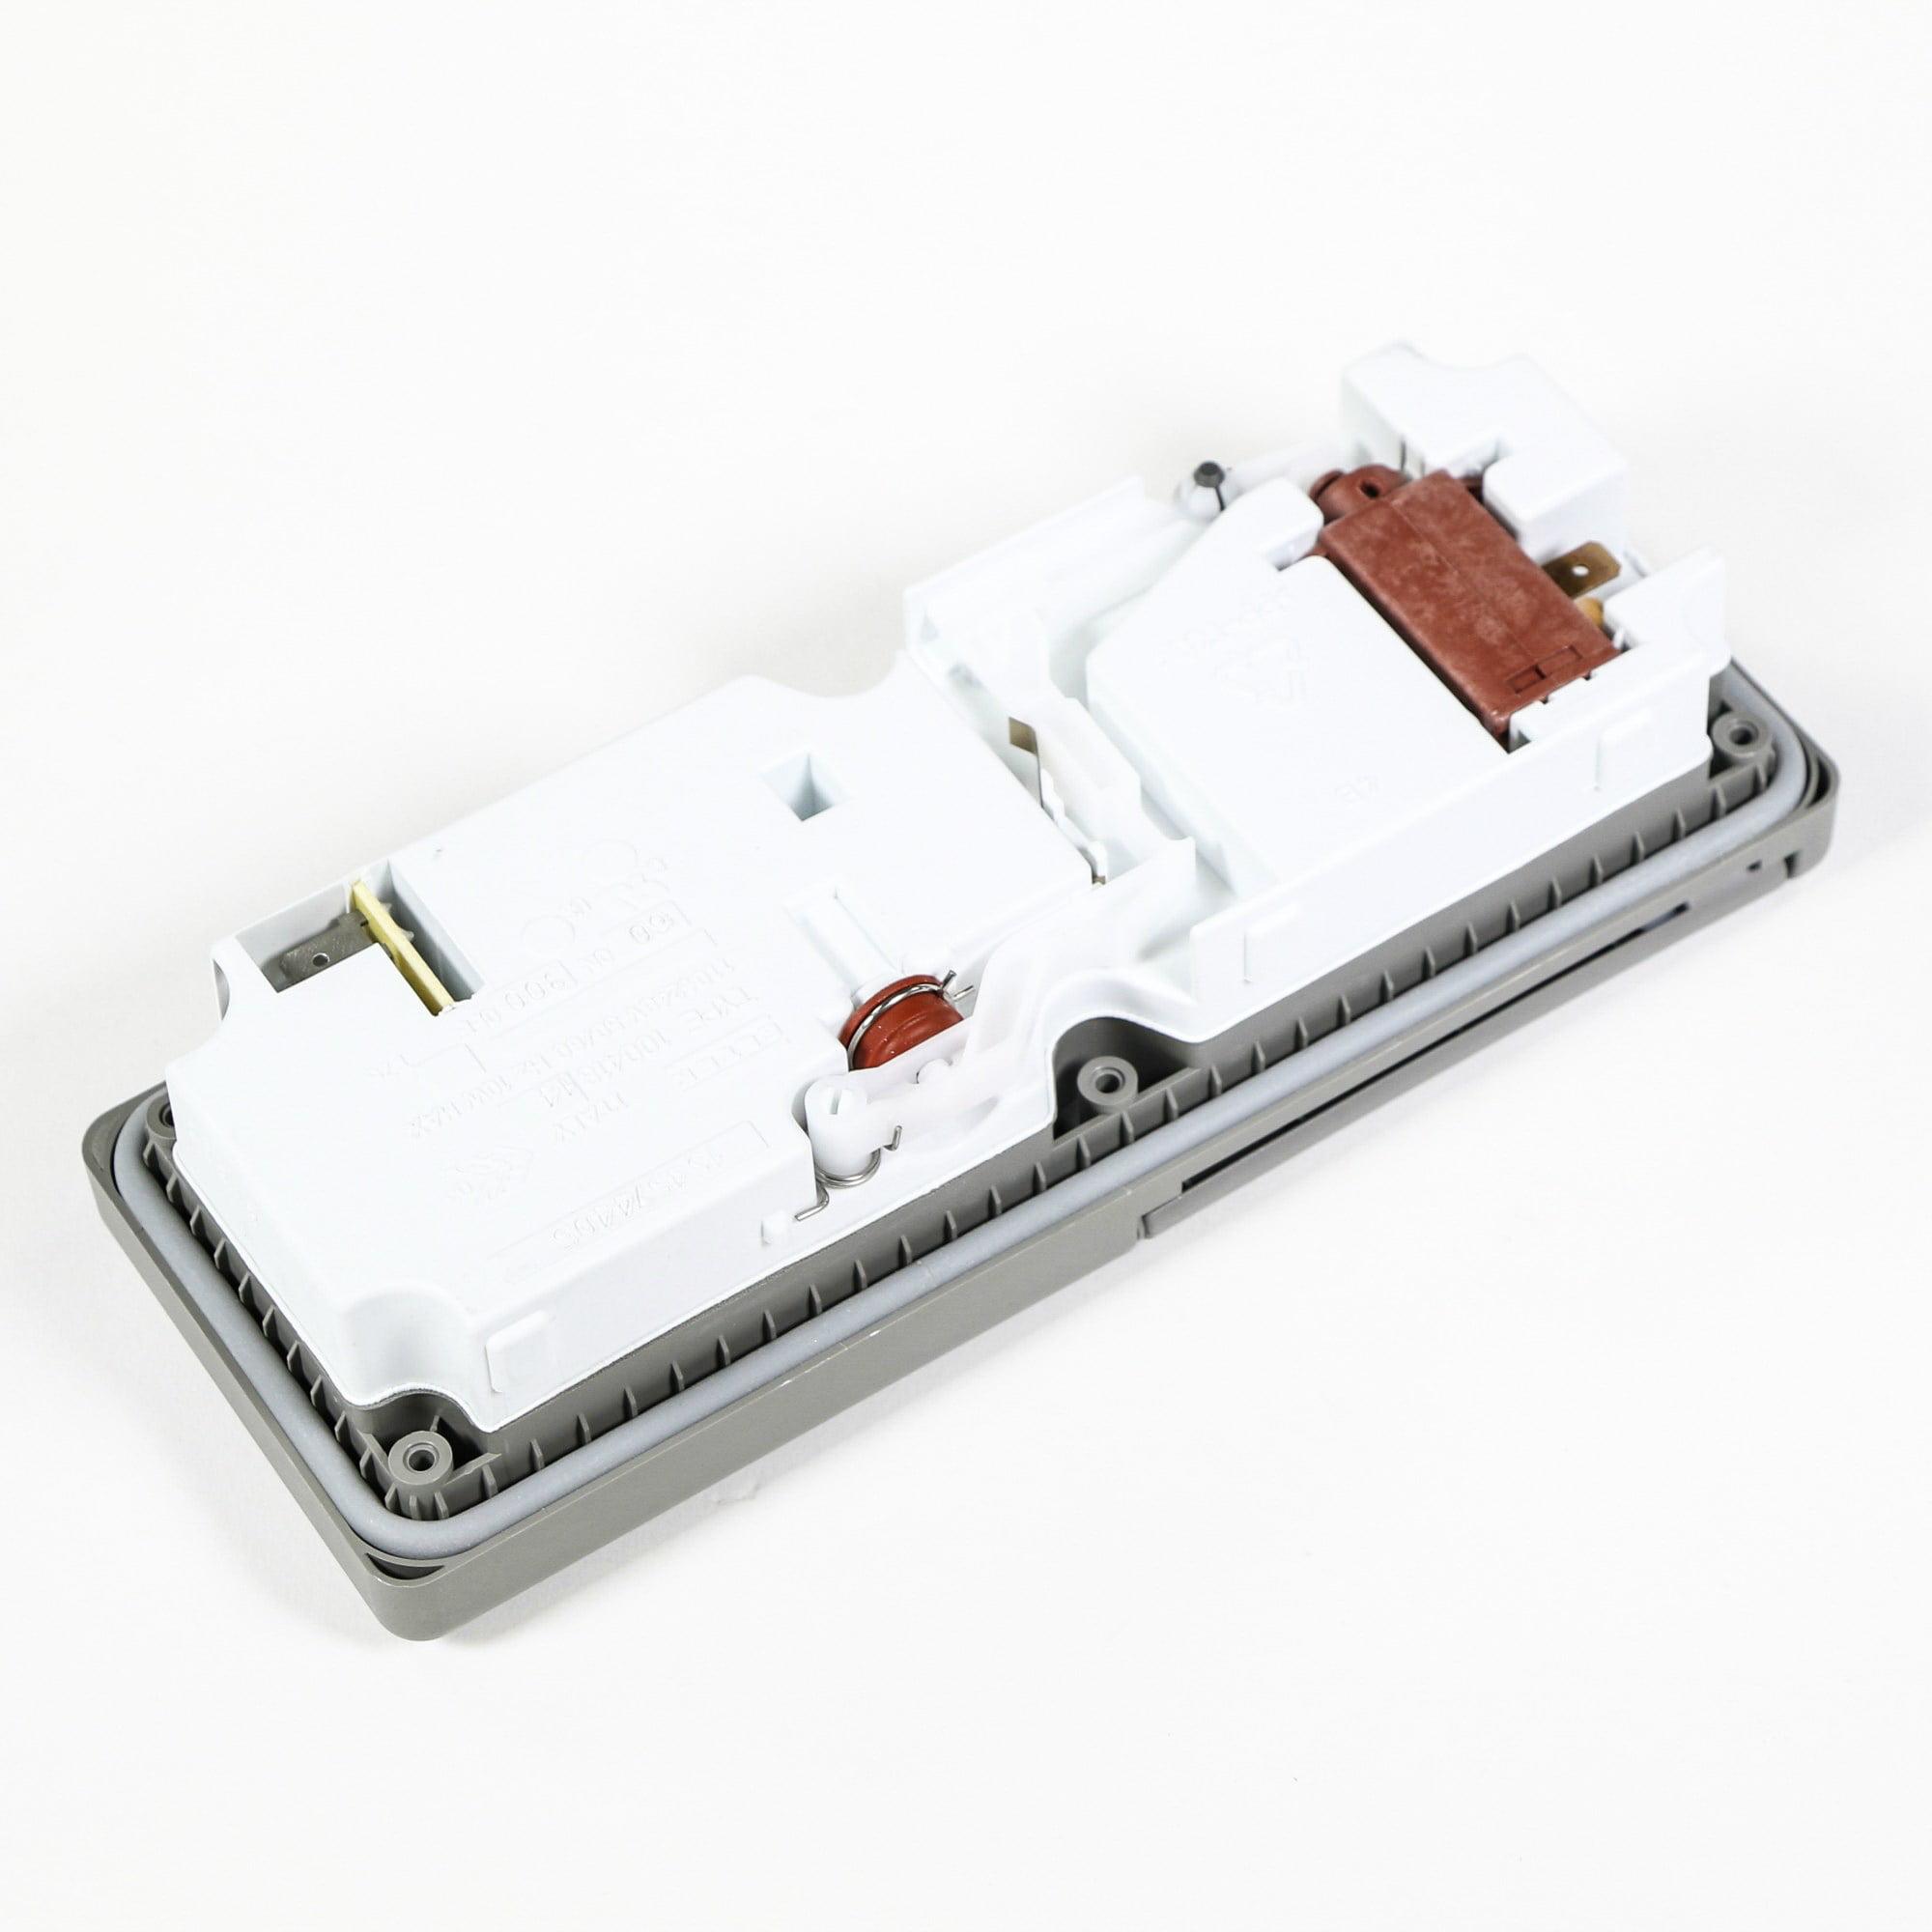 5304507354 For Frigidaire Dishwasher Detergent Dispenser